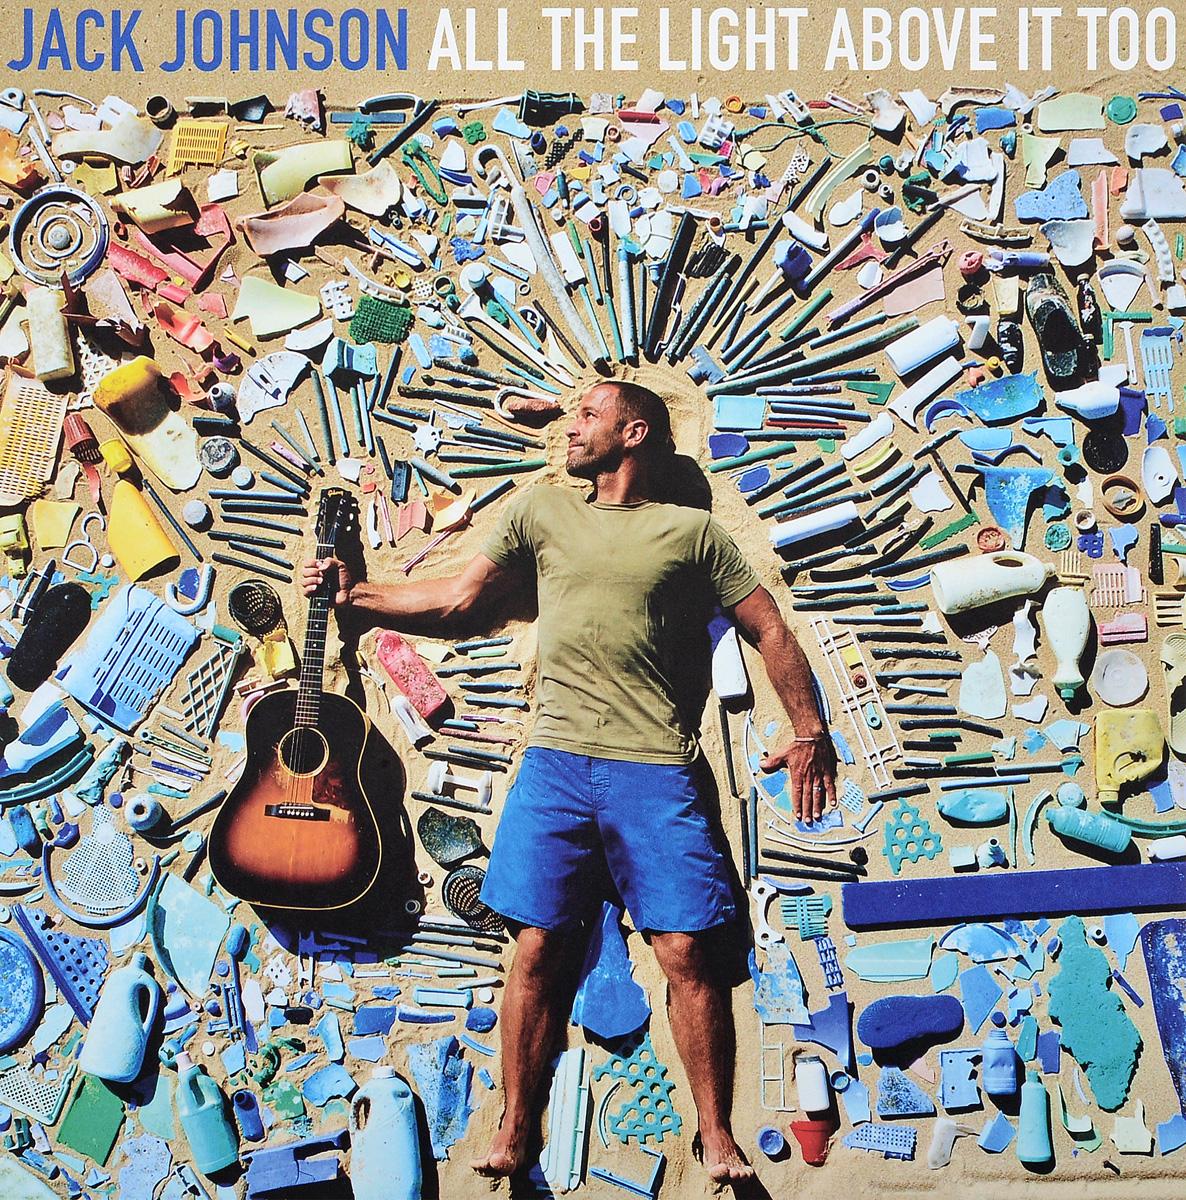 Джек Джонсон Jack Johnson. All The Light Above It Too (LP)